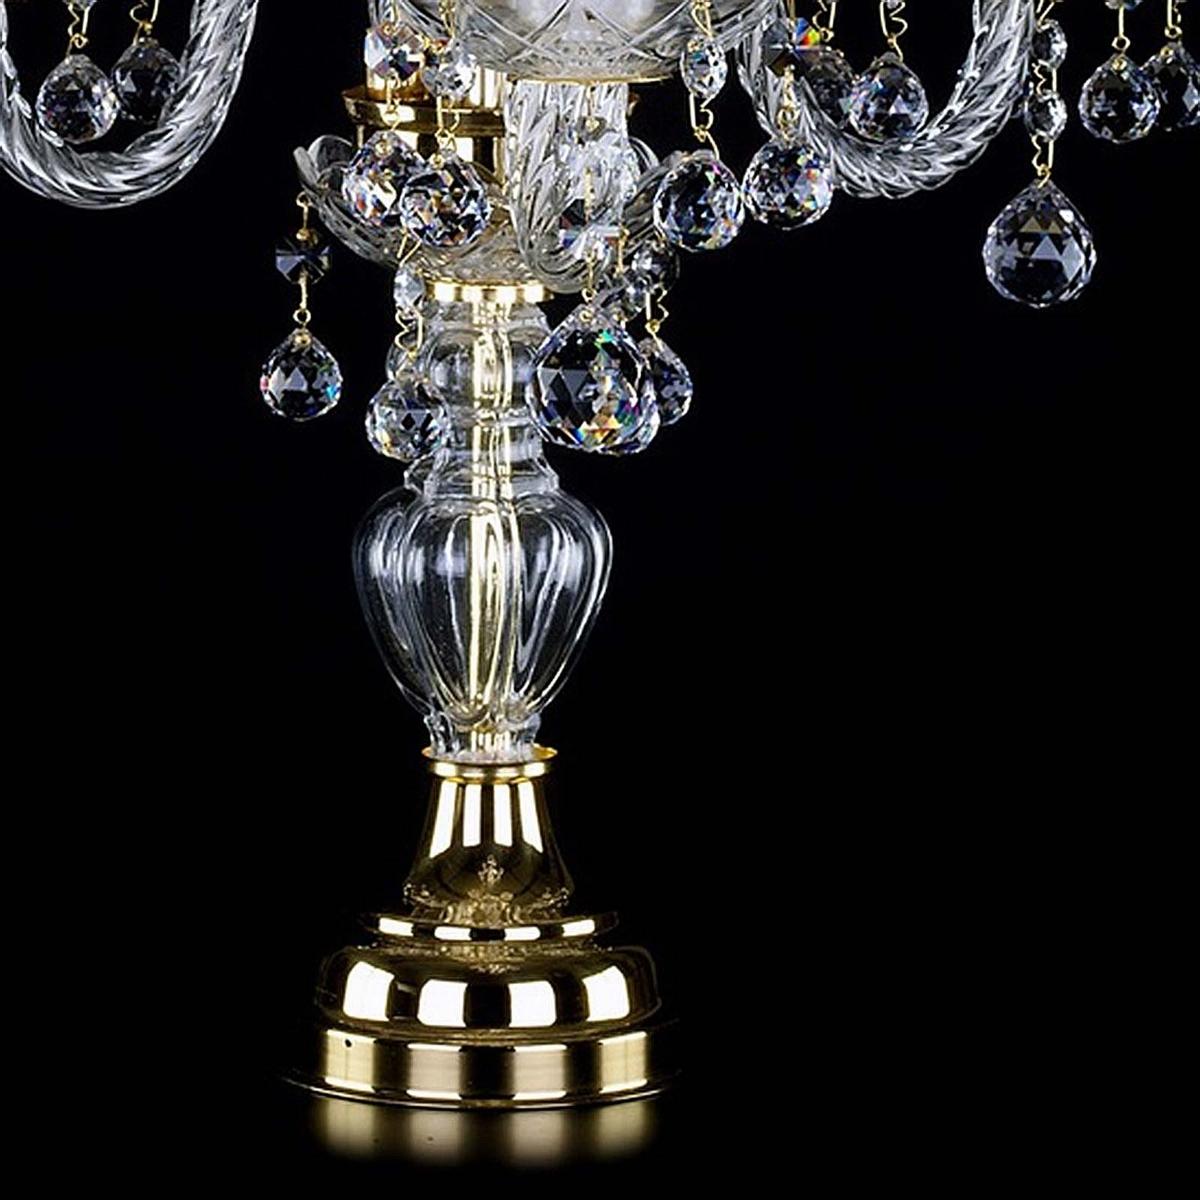 Lampe de bureau de cristal MARKETA III. balls